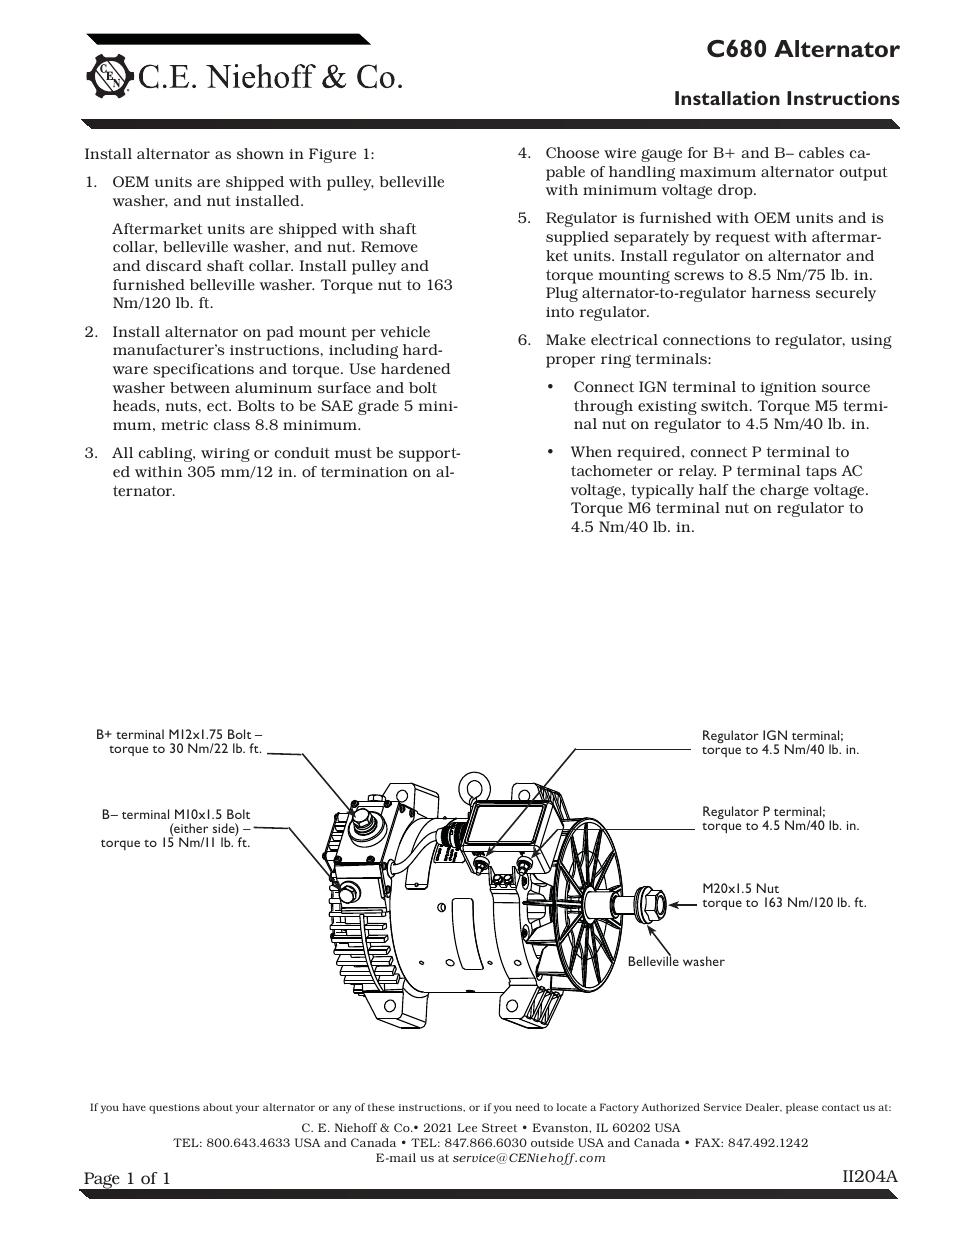 Holley Alternator 197 Manual Guide